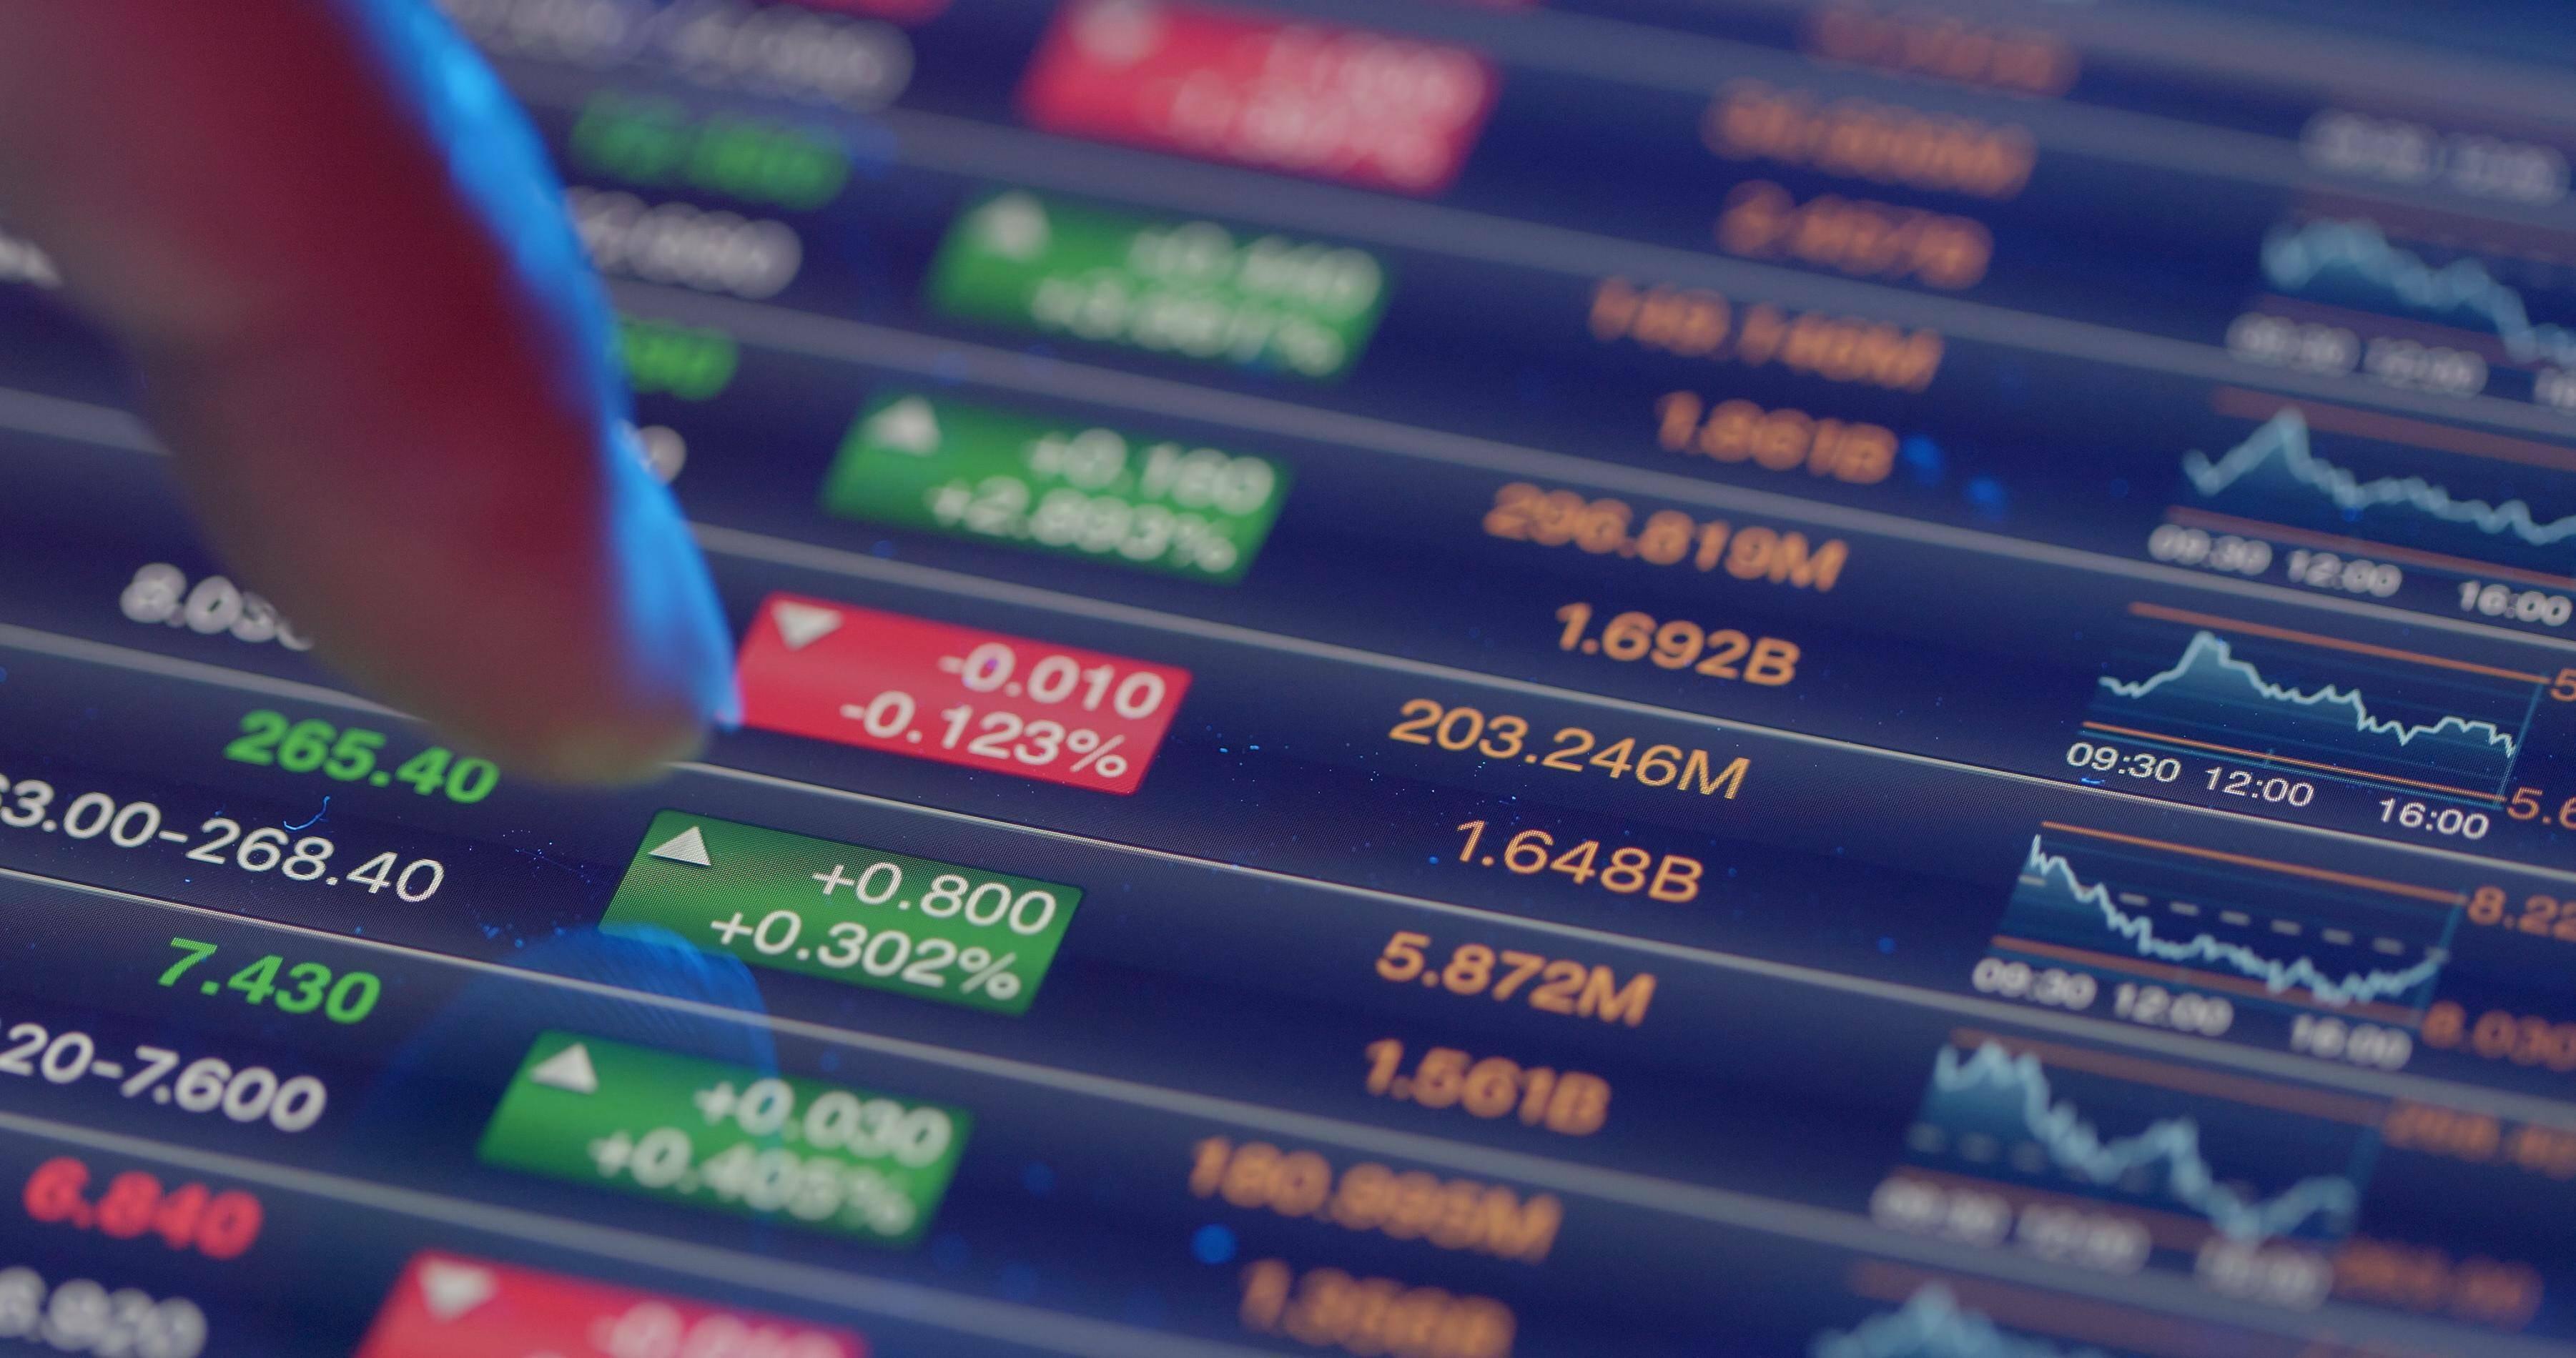 Fondskosten: Warum Profianleger Fondsanteile billiger bekommen